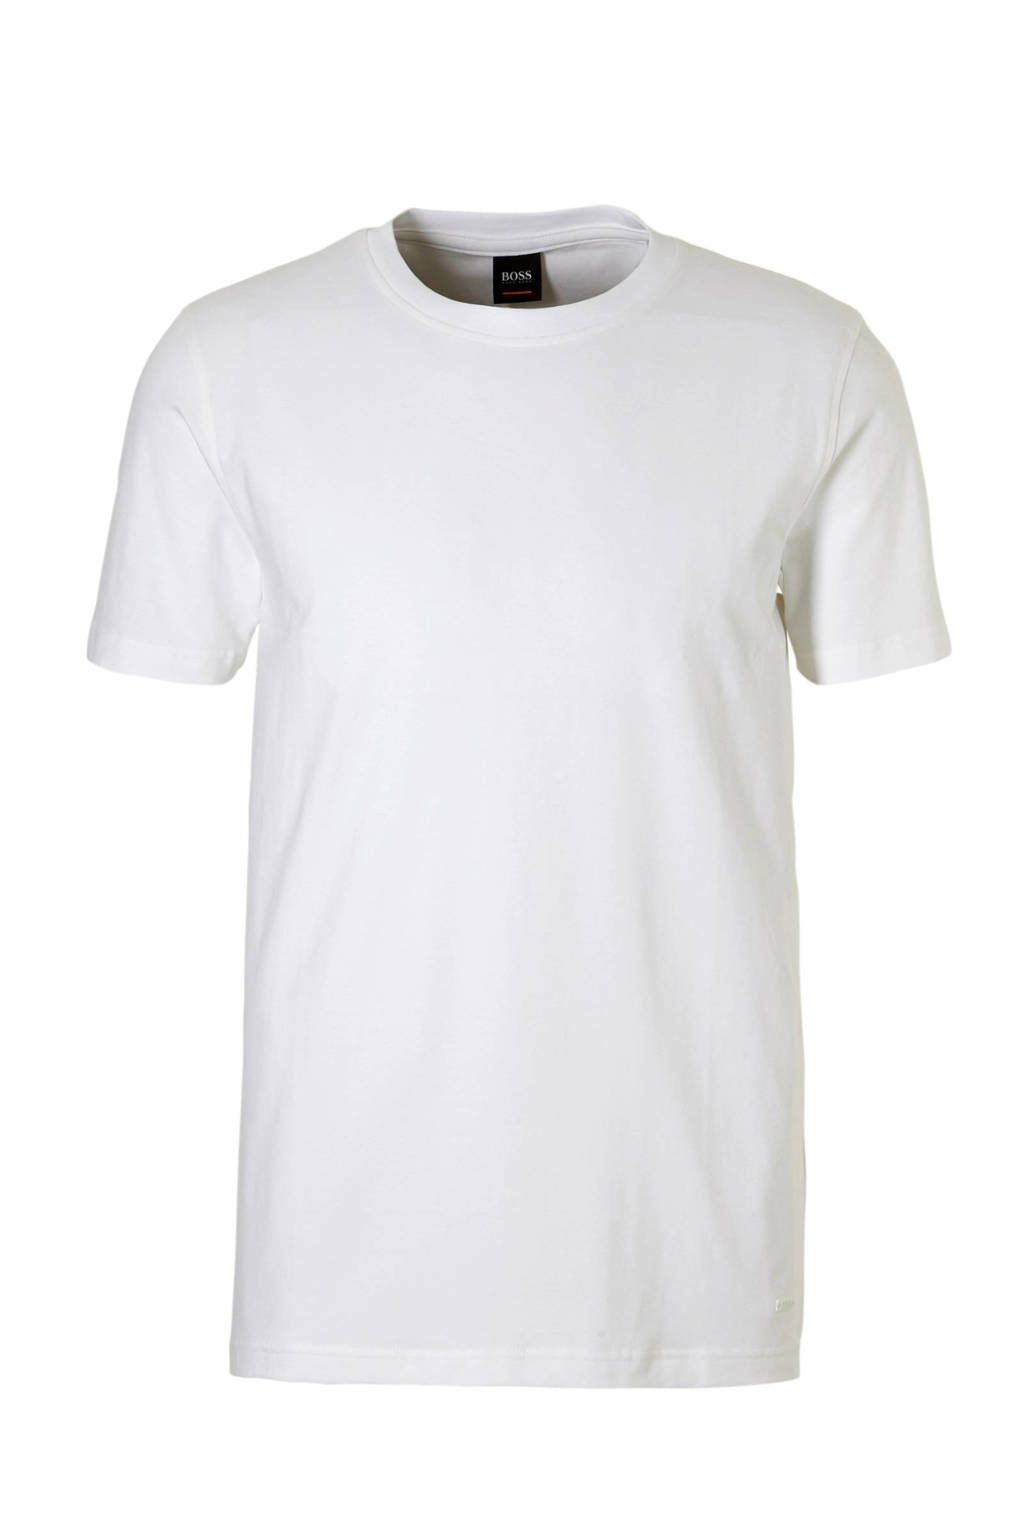 Boss Casual T-shirt, Wit